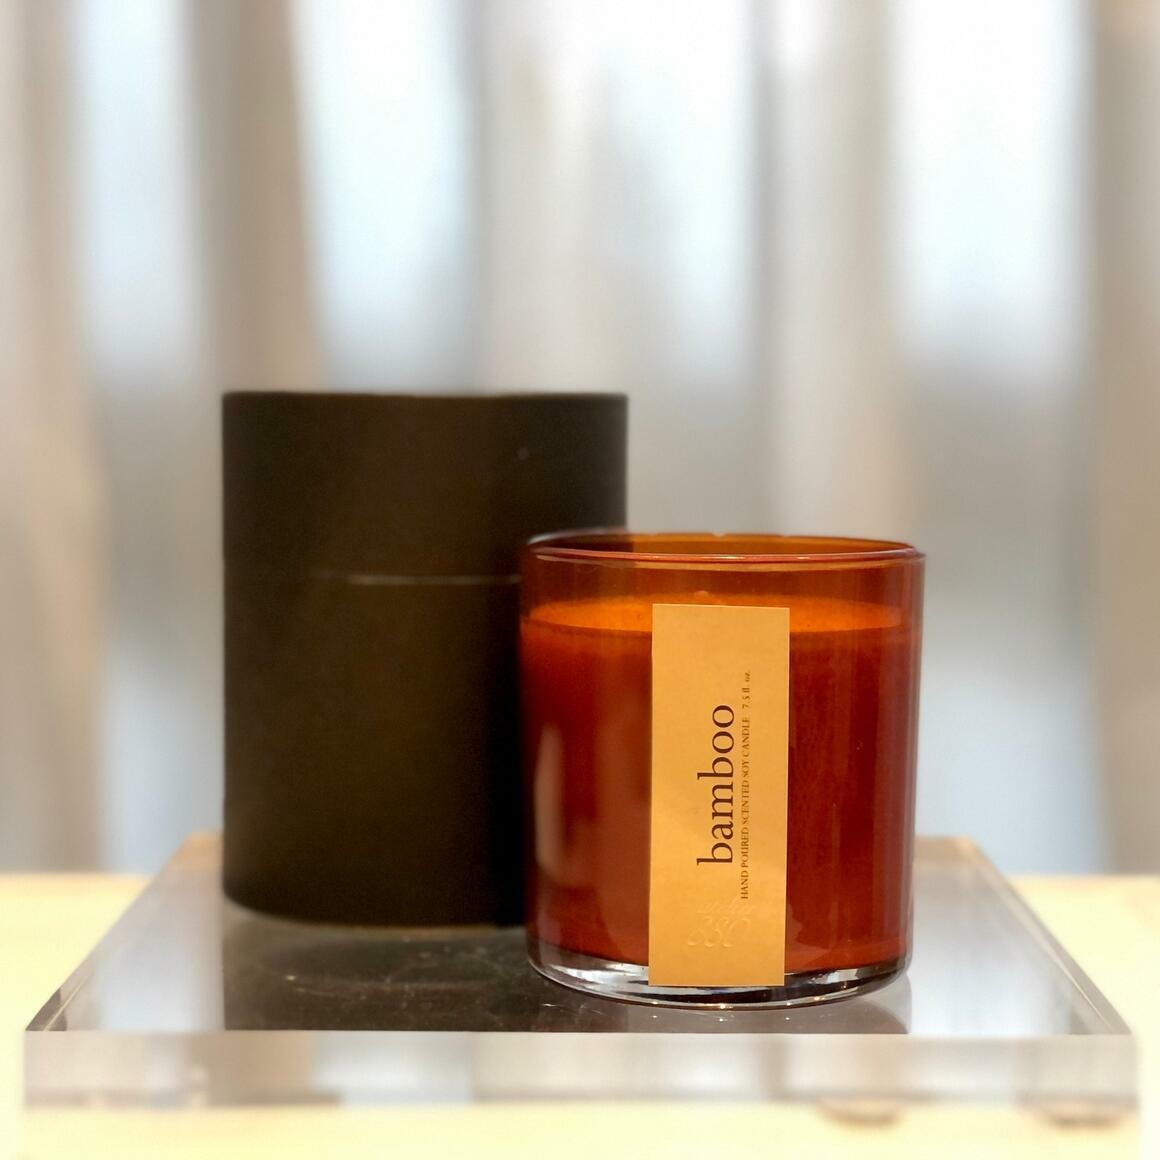 Minimalist Scented Candles - Amber Glass / Gift Box | Trada Marketplace